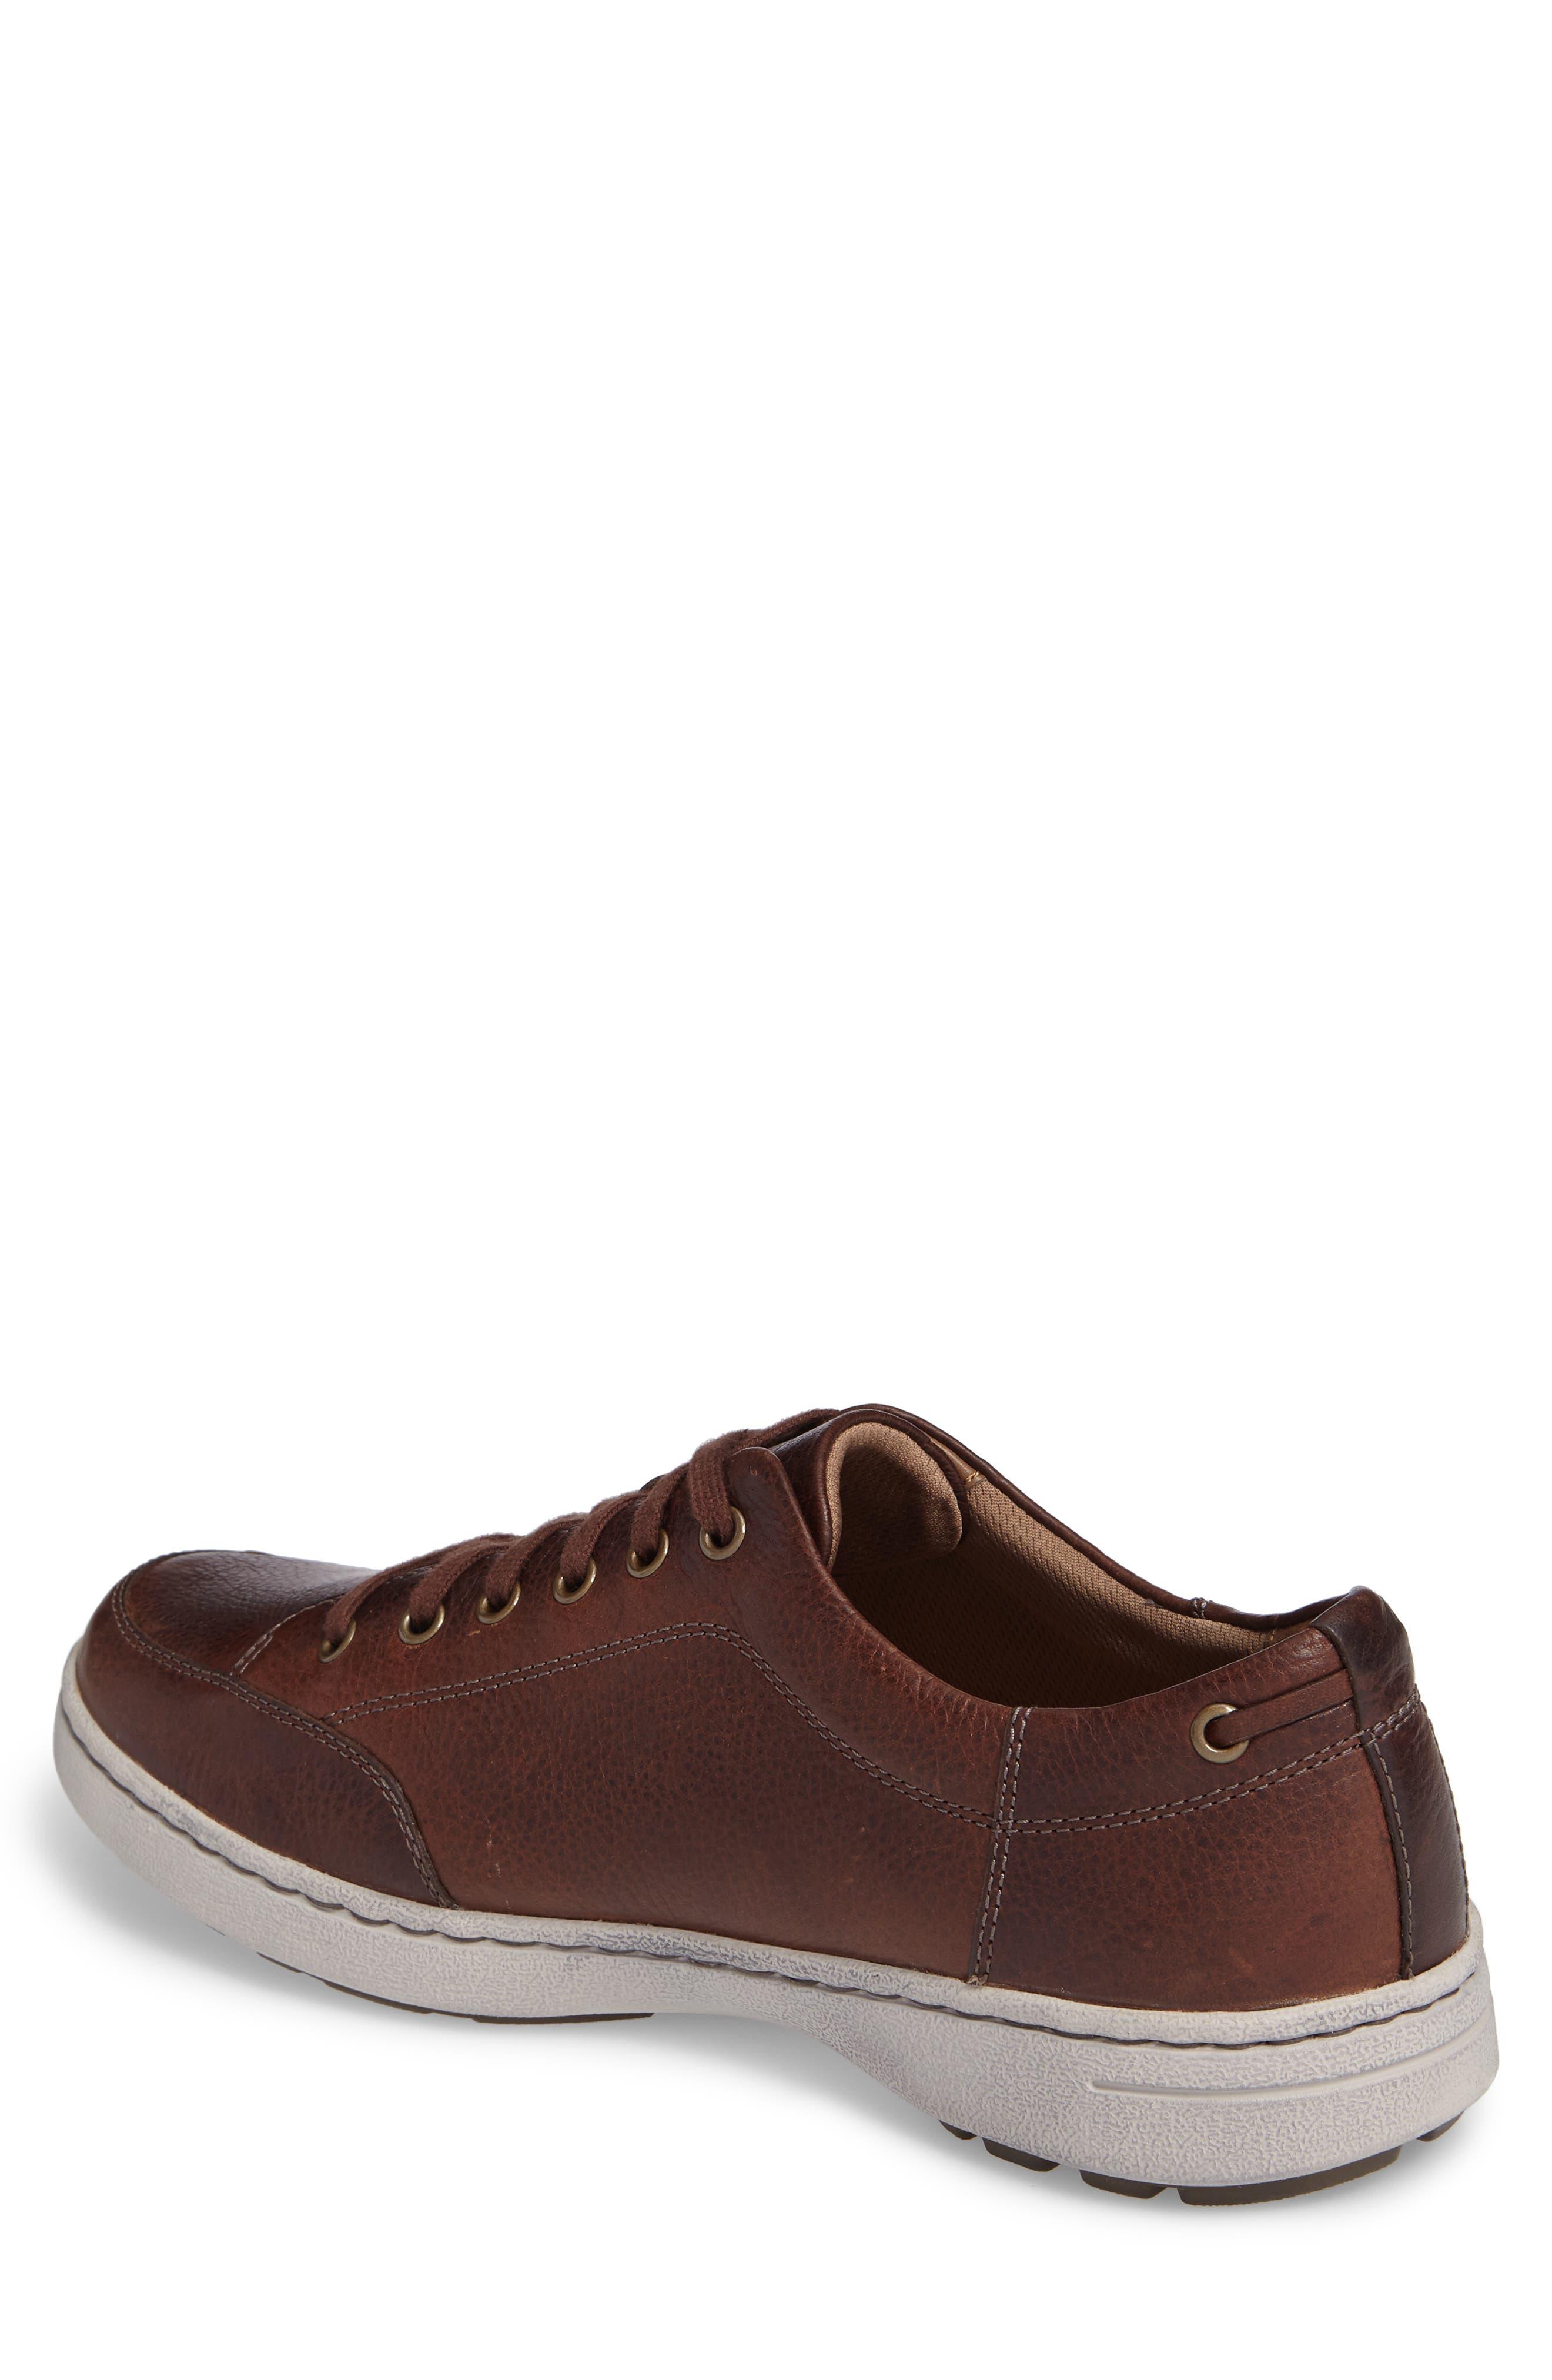 Alternate Image 2  - Dansko 'Vaughn' Water-Resistant Sneaker (Men)